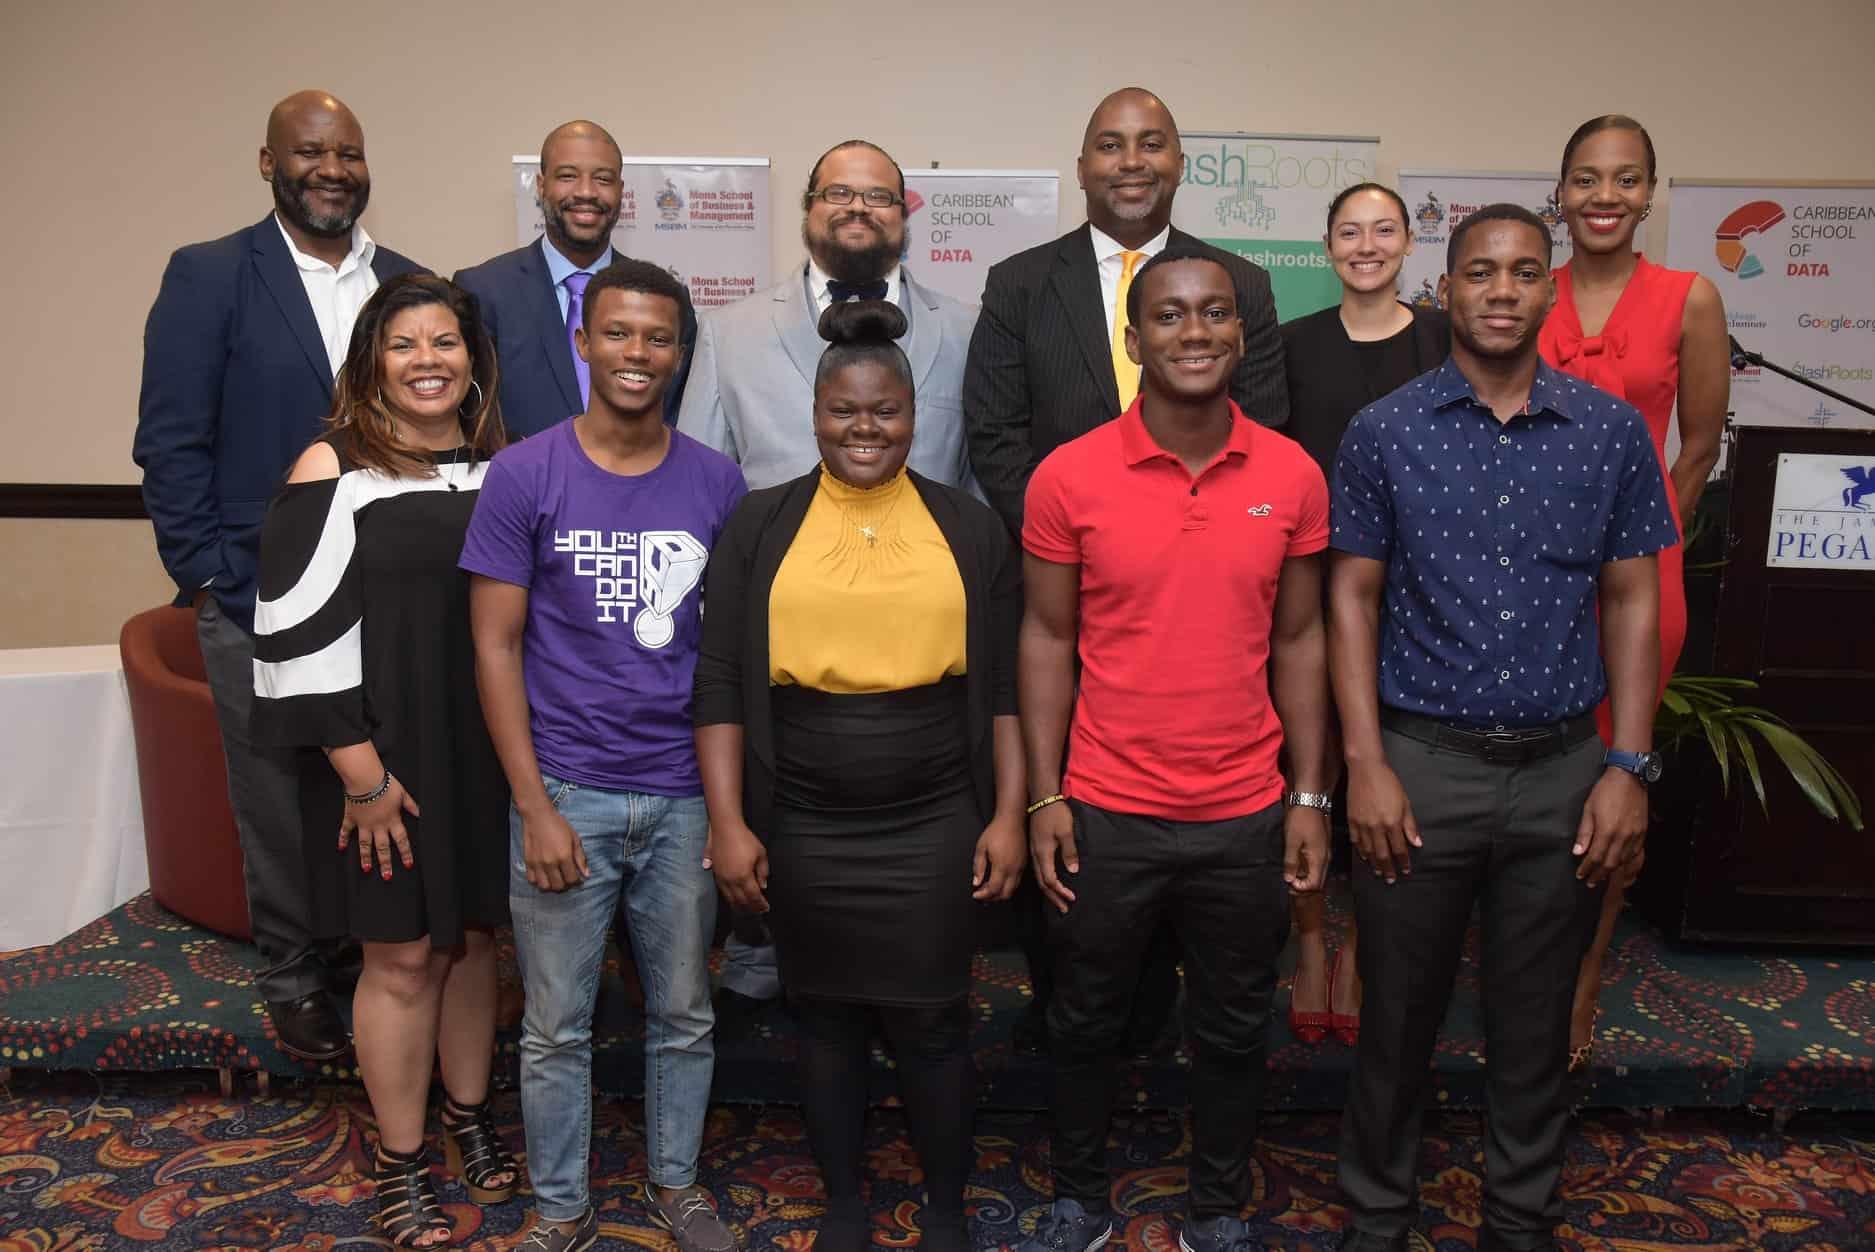 Organizers, speakers, facilitators of the Jamaica leg of the CSOD